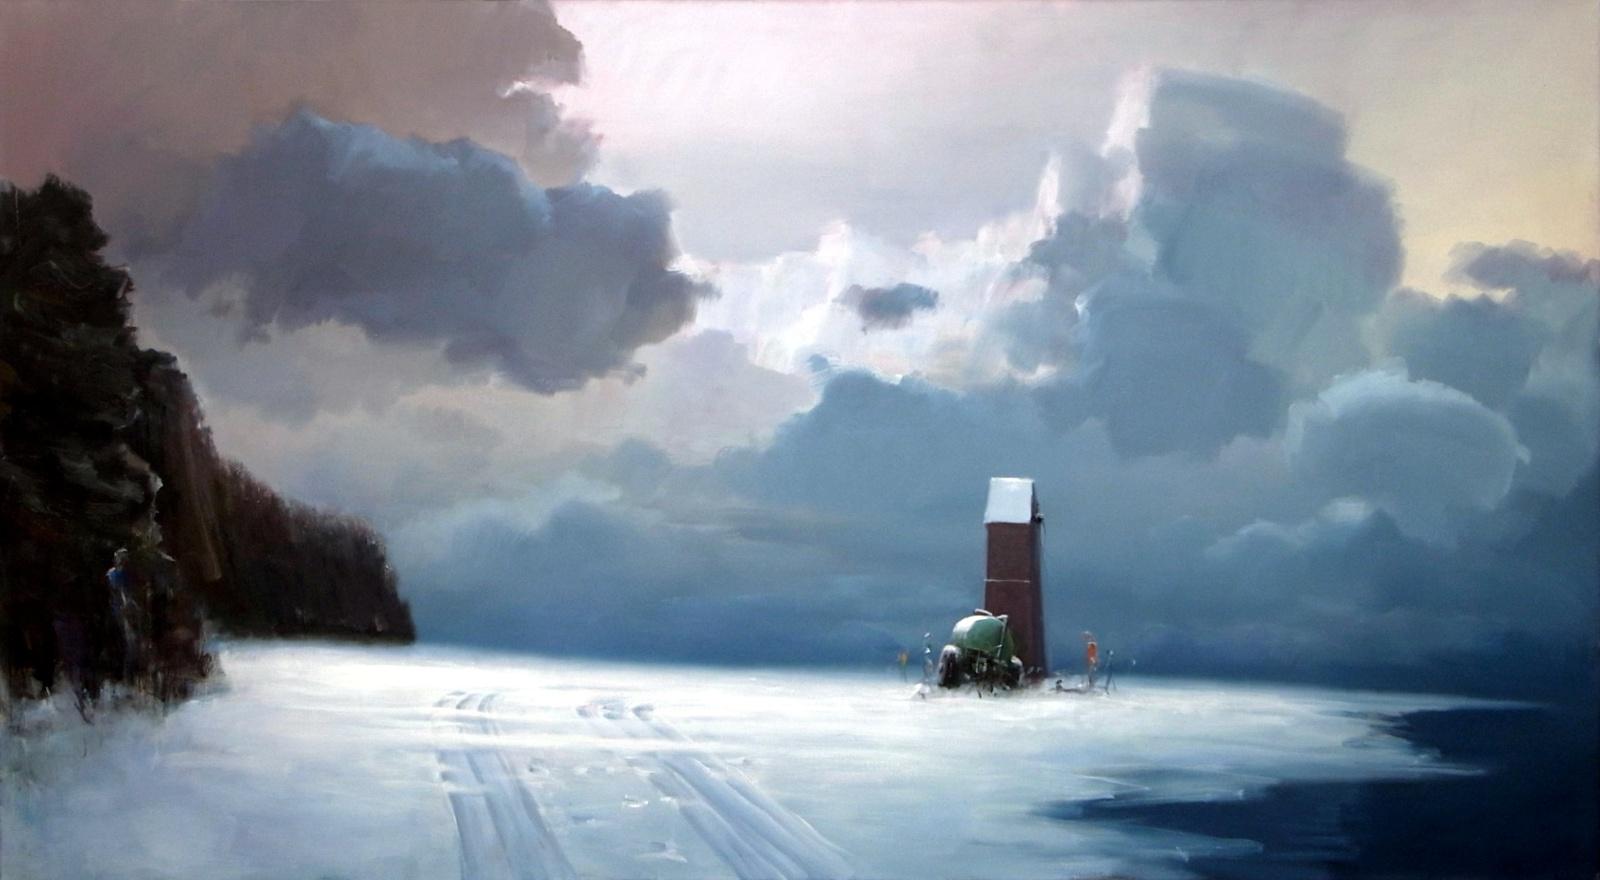 exposition art blog poul anker bech surreal landscapes